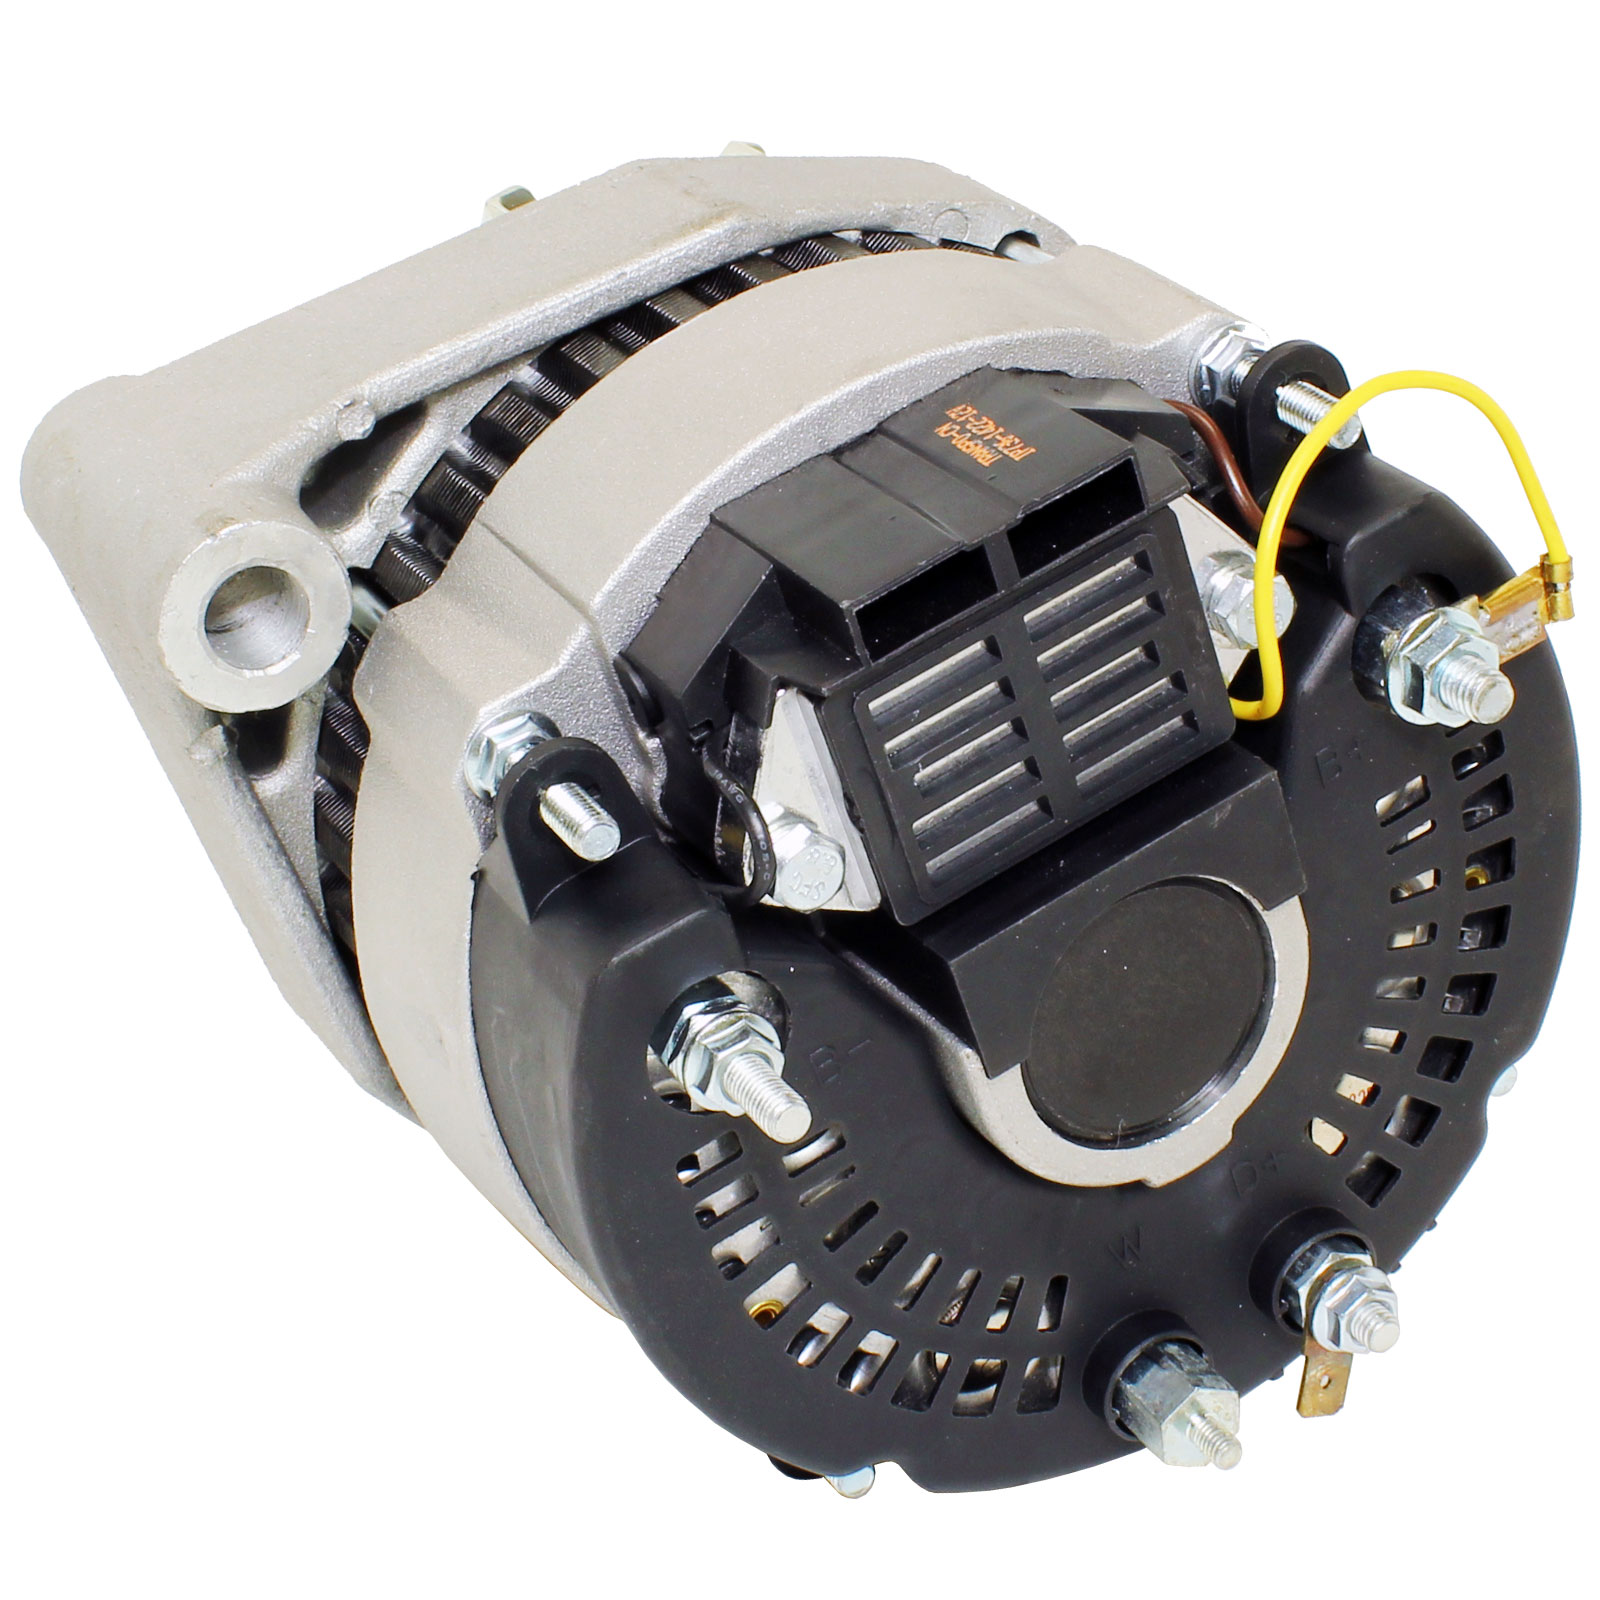 Alternator Fits Volvo Penta Md2 Md2010 Md2020 Md2030